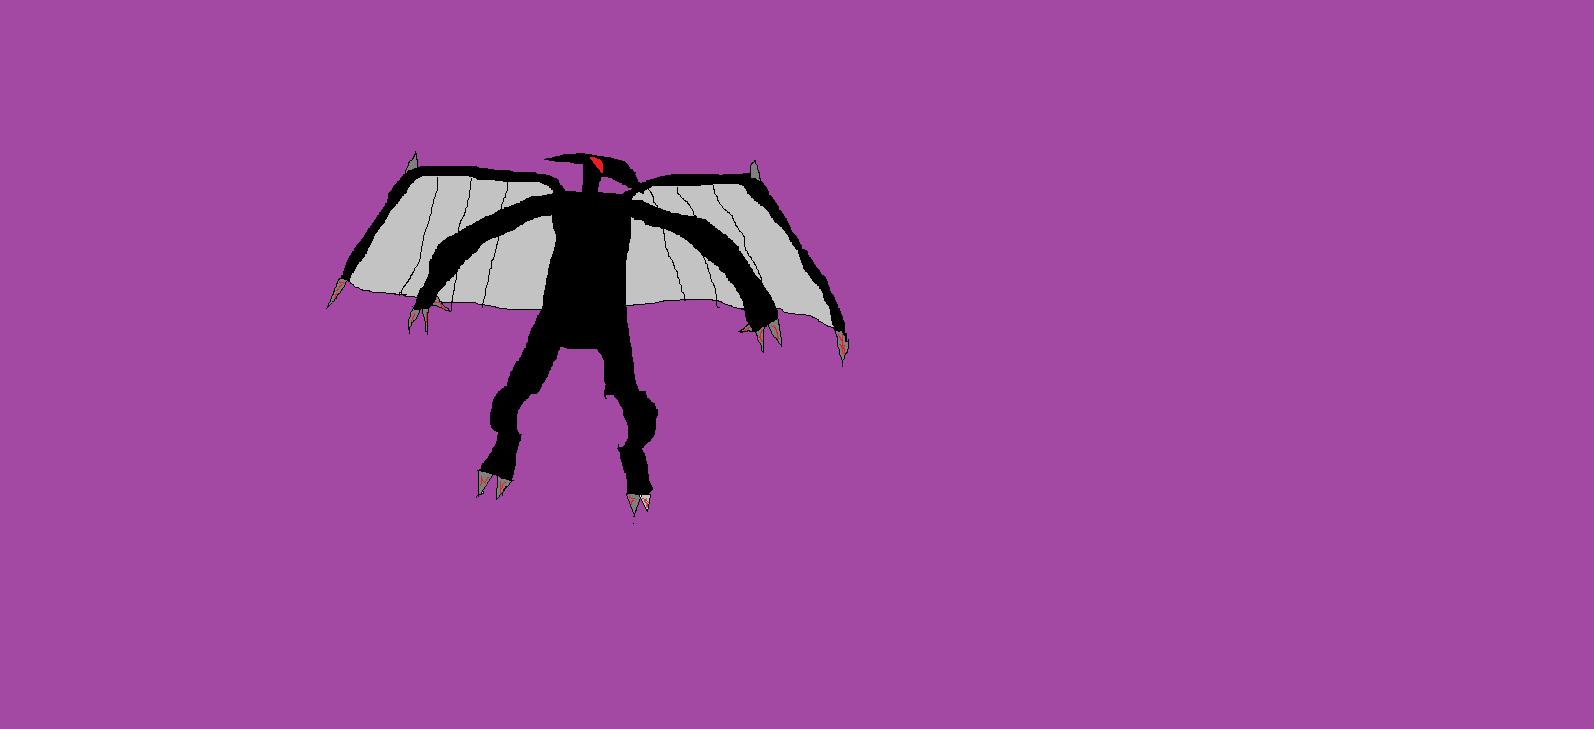 the dragon demon (via windows paint)